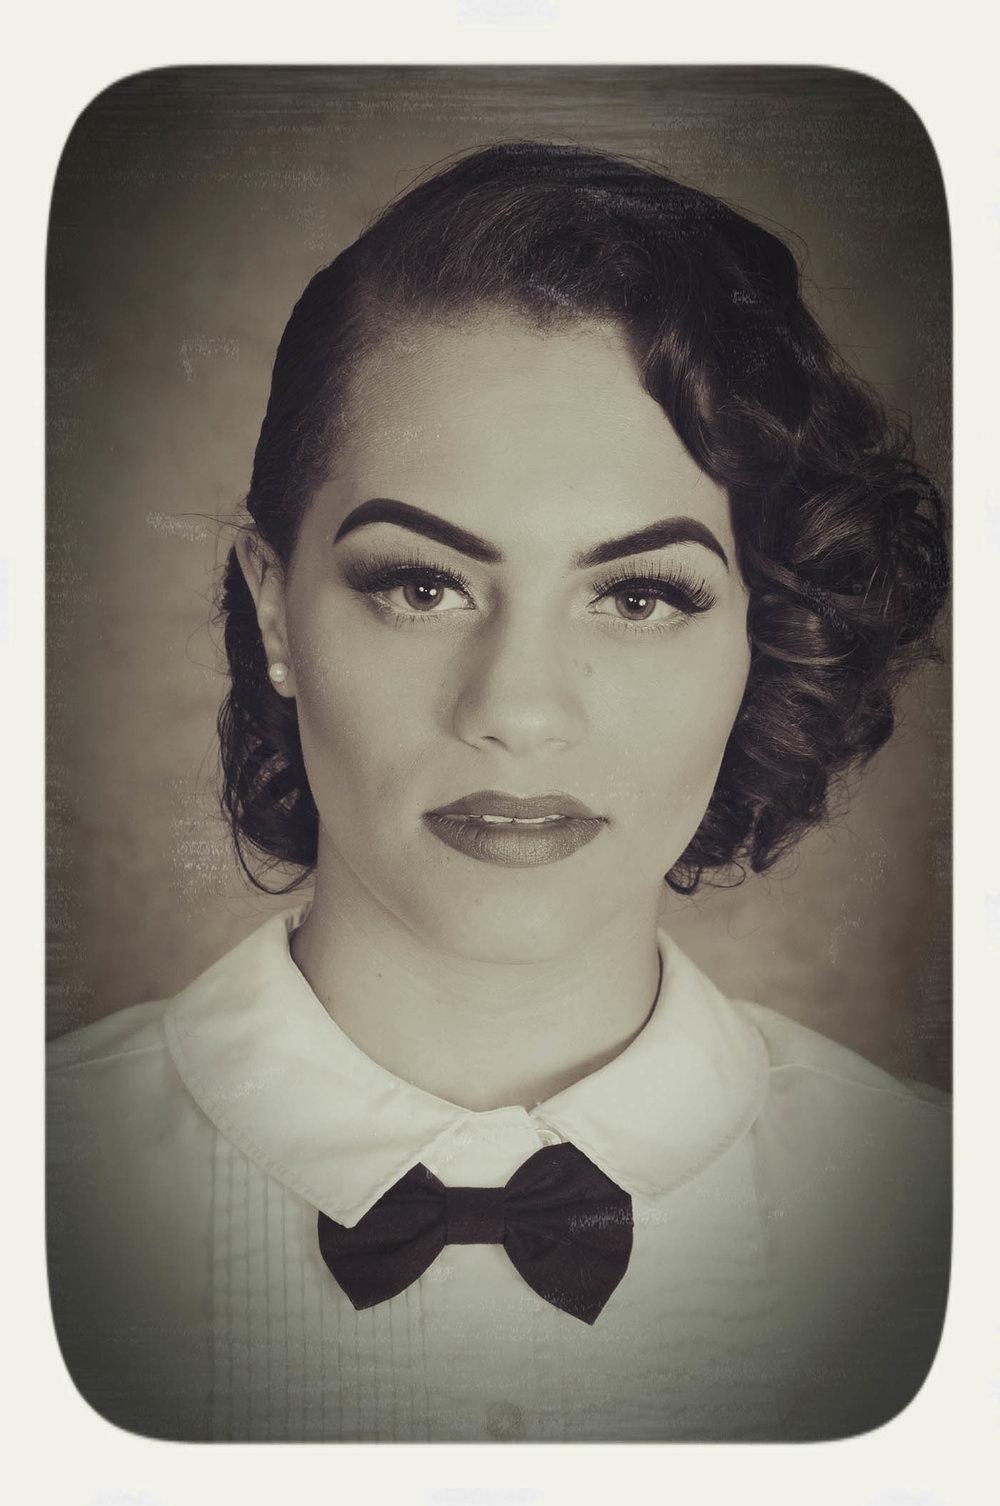 Vintage black and white photo, sepia toned